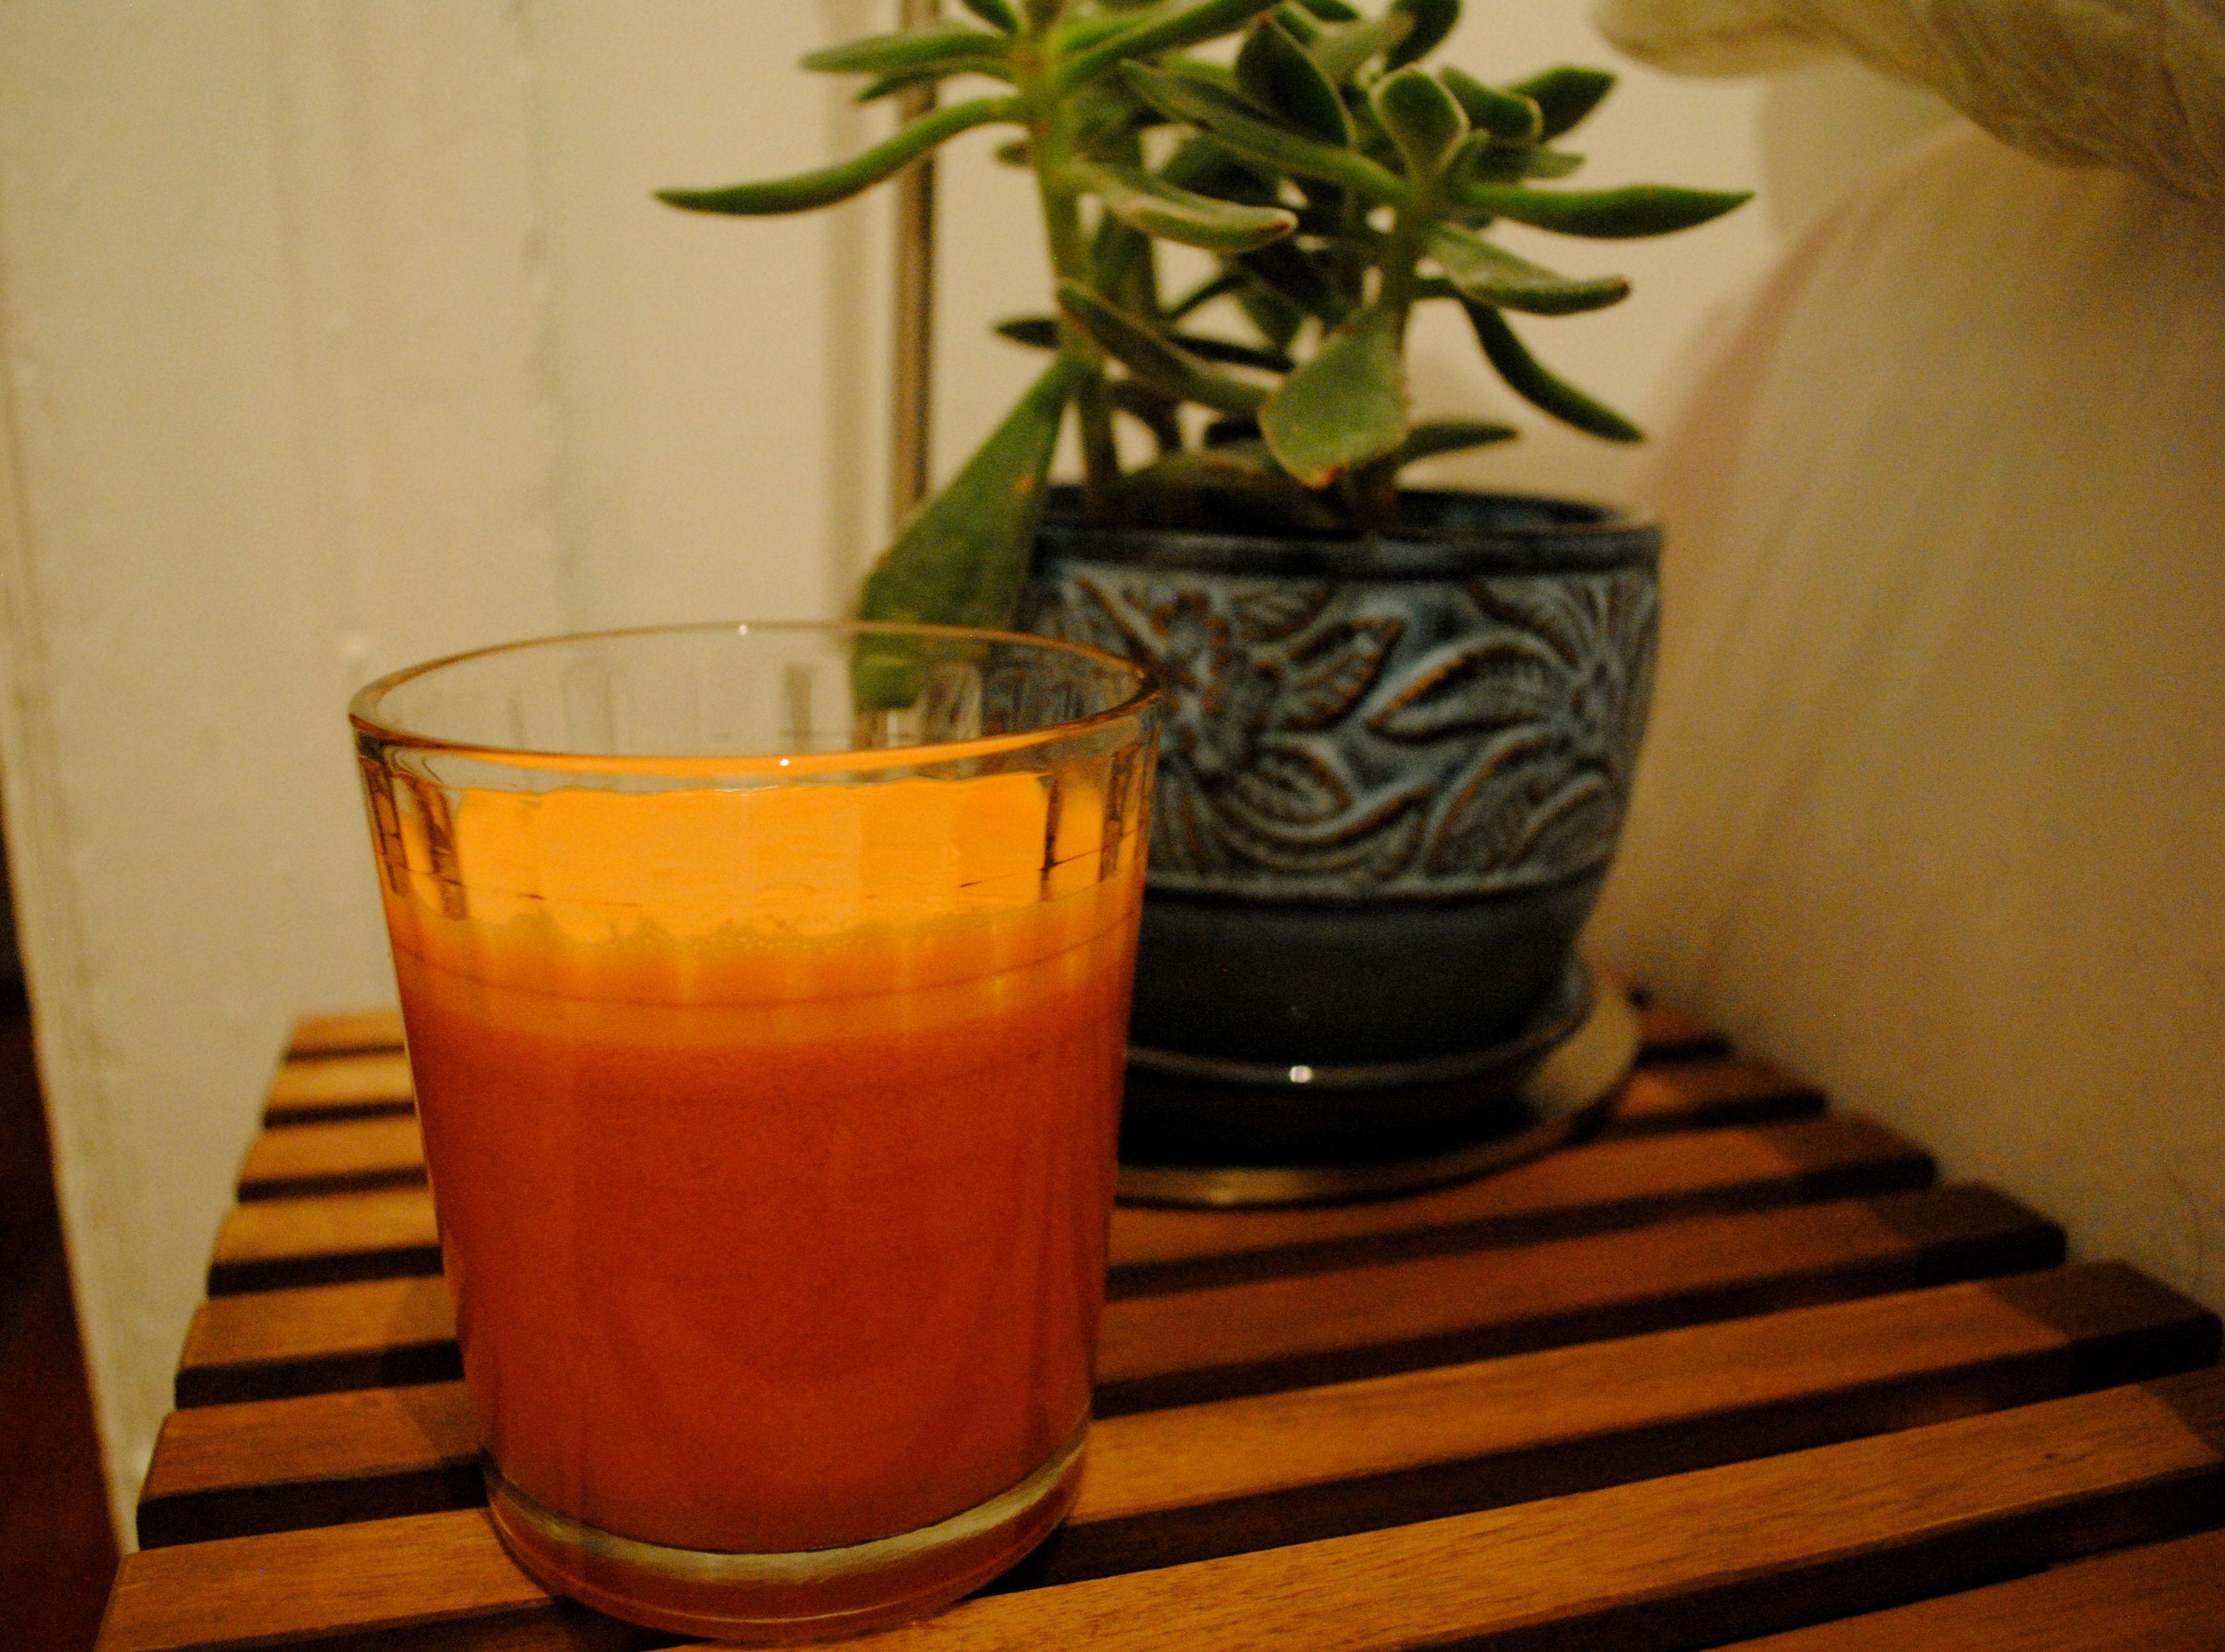 Carrots & apple juice Carrot apple juice, Apple juice, Apple